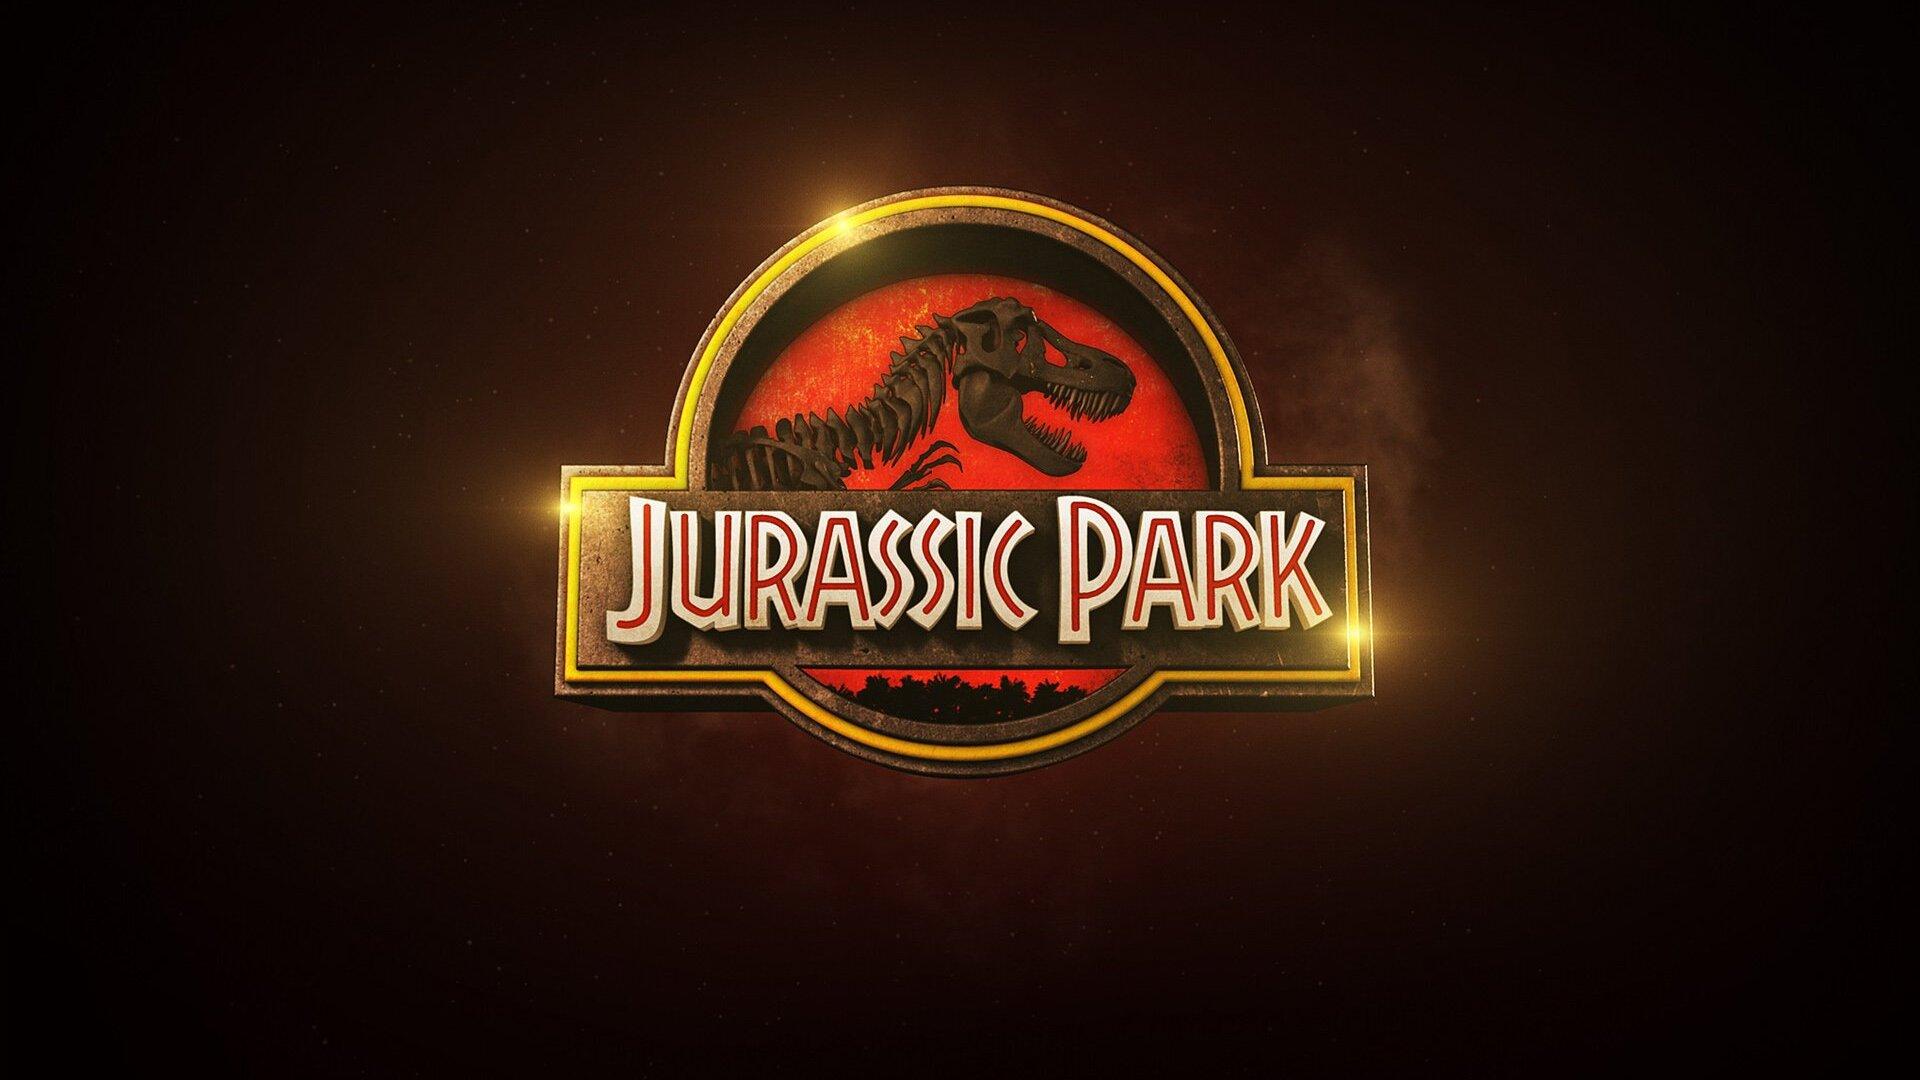 1920x1080 Jurassic Park Logo Laptop Full HD 1080P HD 4k ...